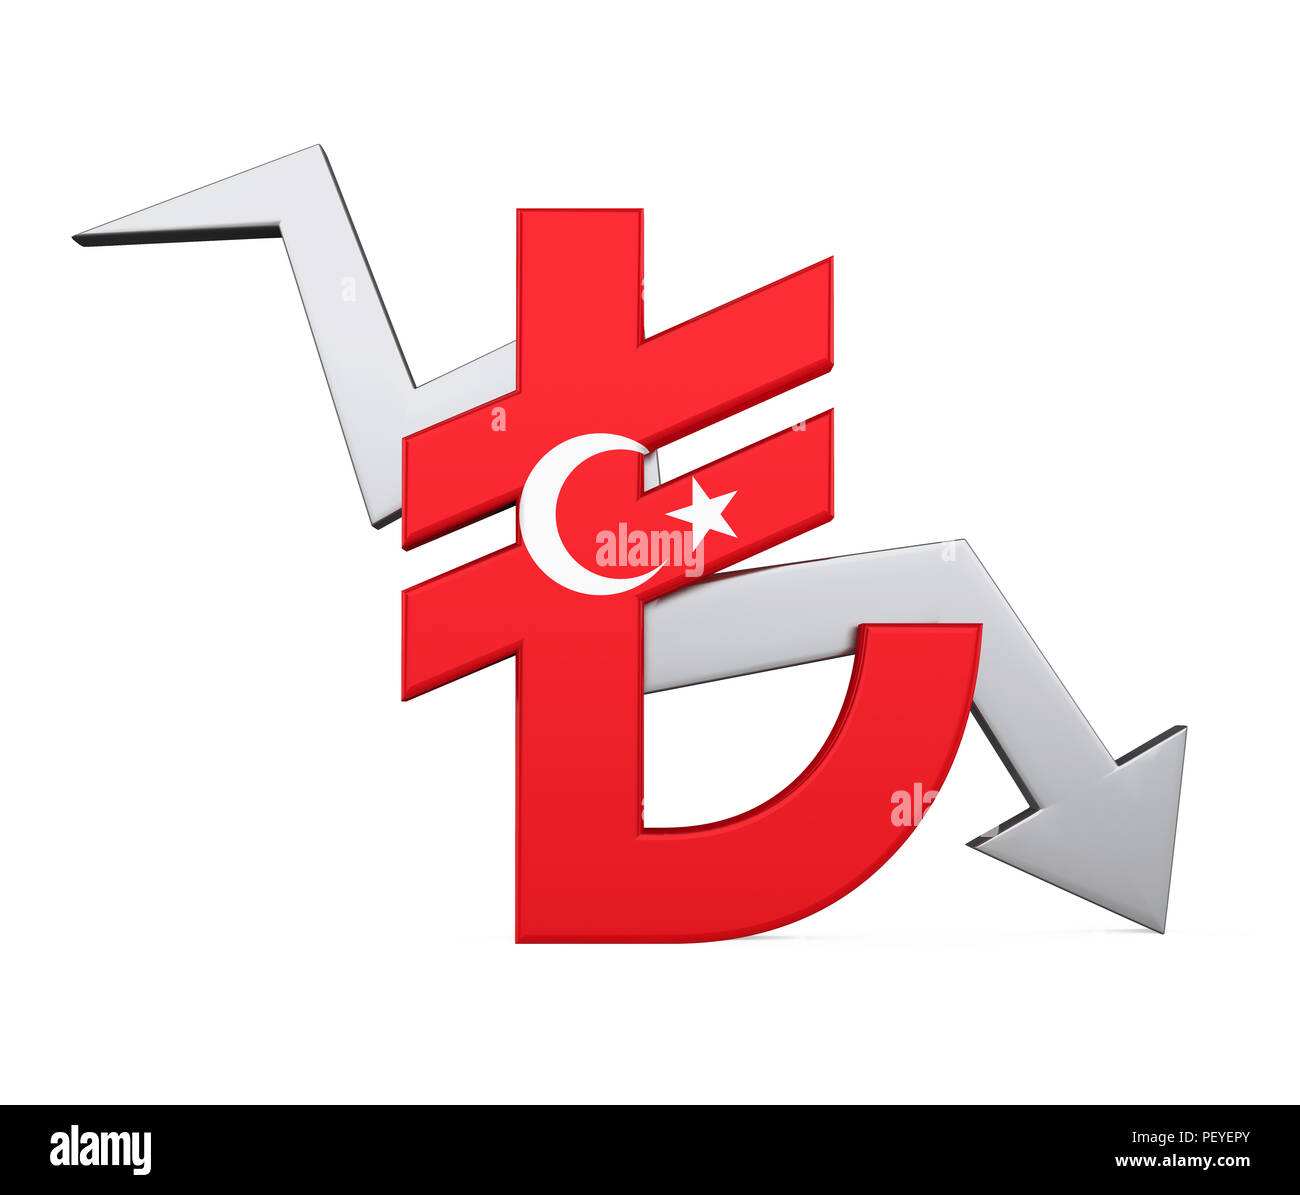 Turkish Lira Sign and Arrow Isolated Stock Photo